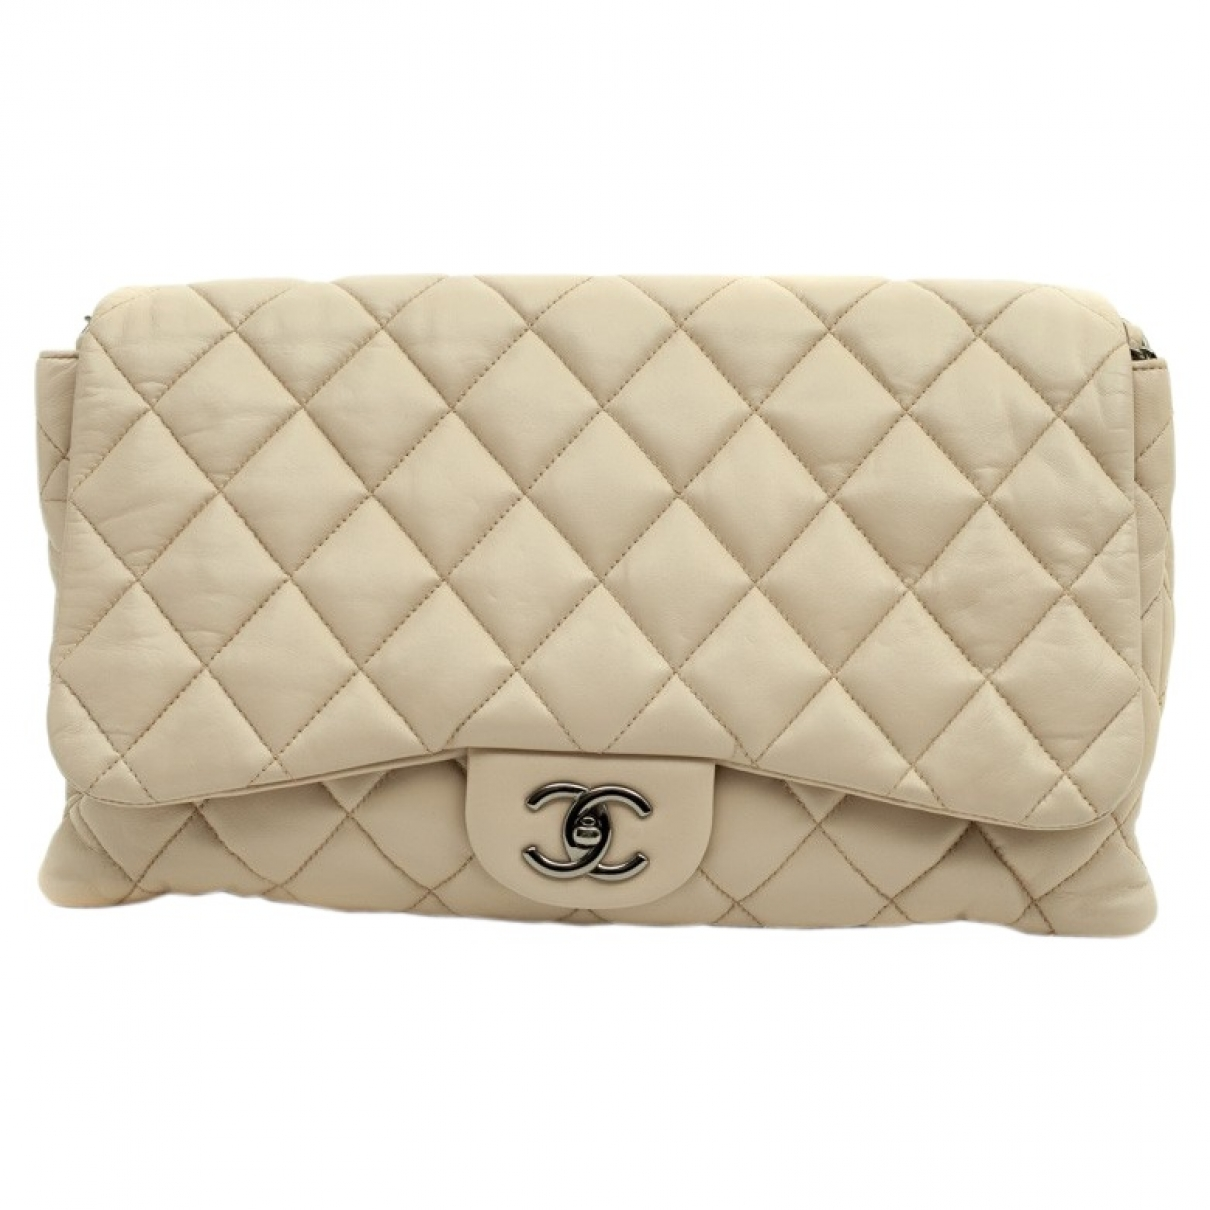 Chanel Timeless/Classique Ecru Leather handbag for Women \N